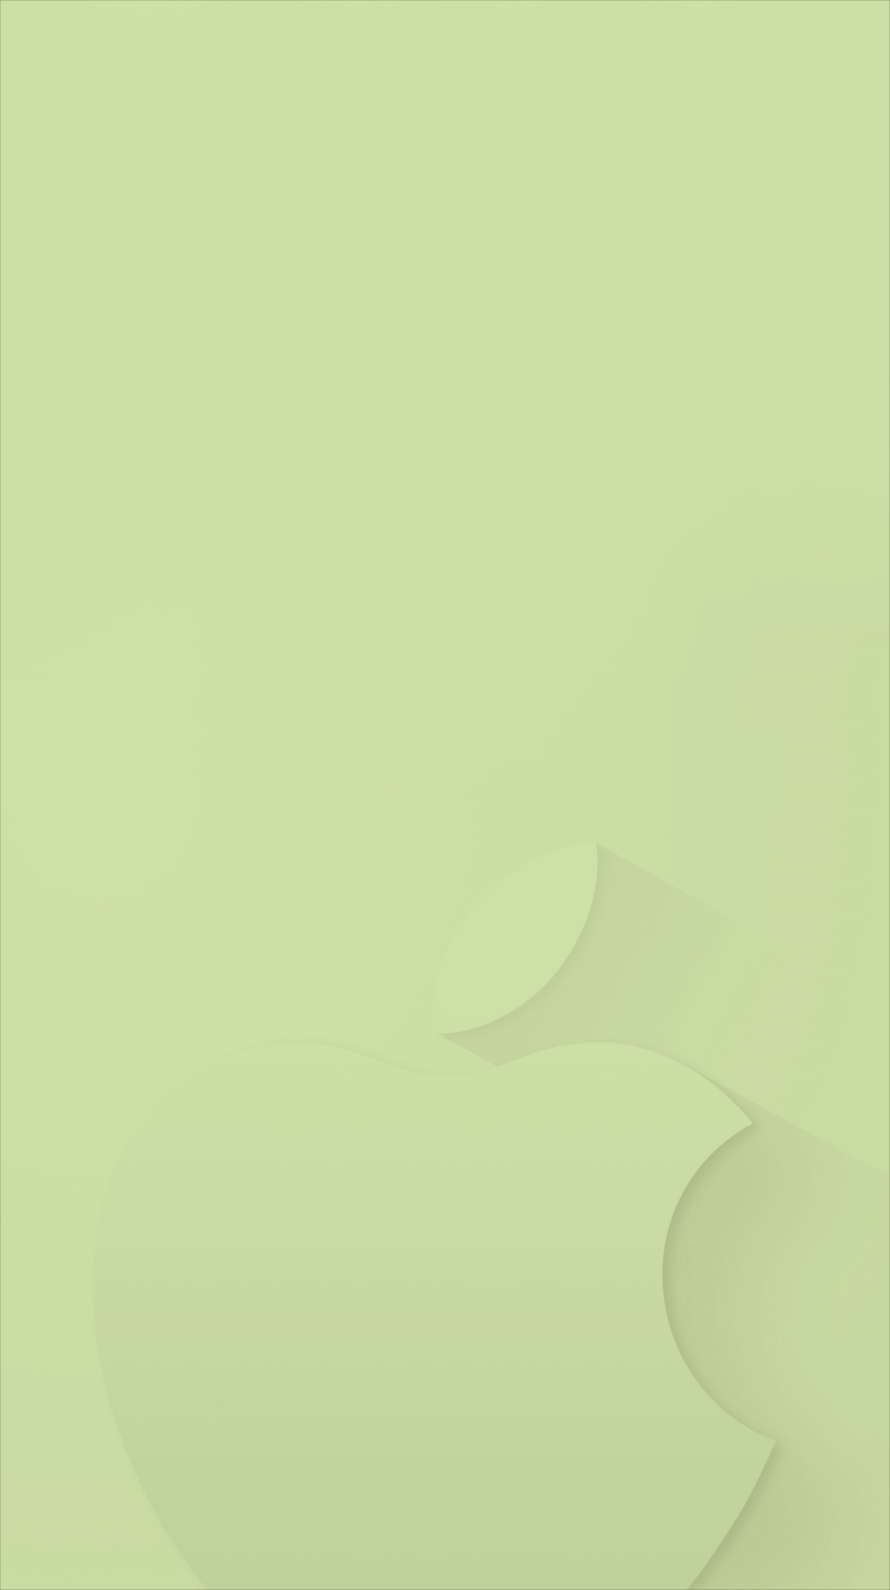 Iphone6壁紙壁紙 スマホ壁紙 Wallpaperbox 21ページ目